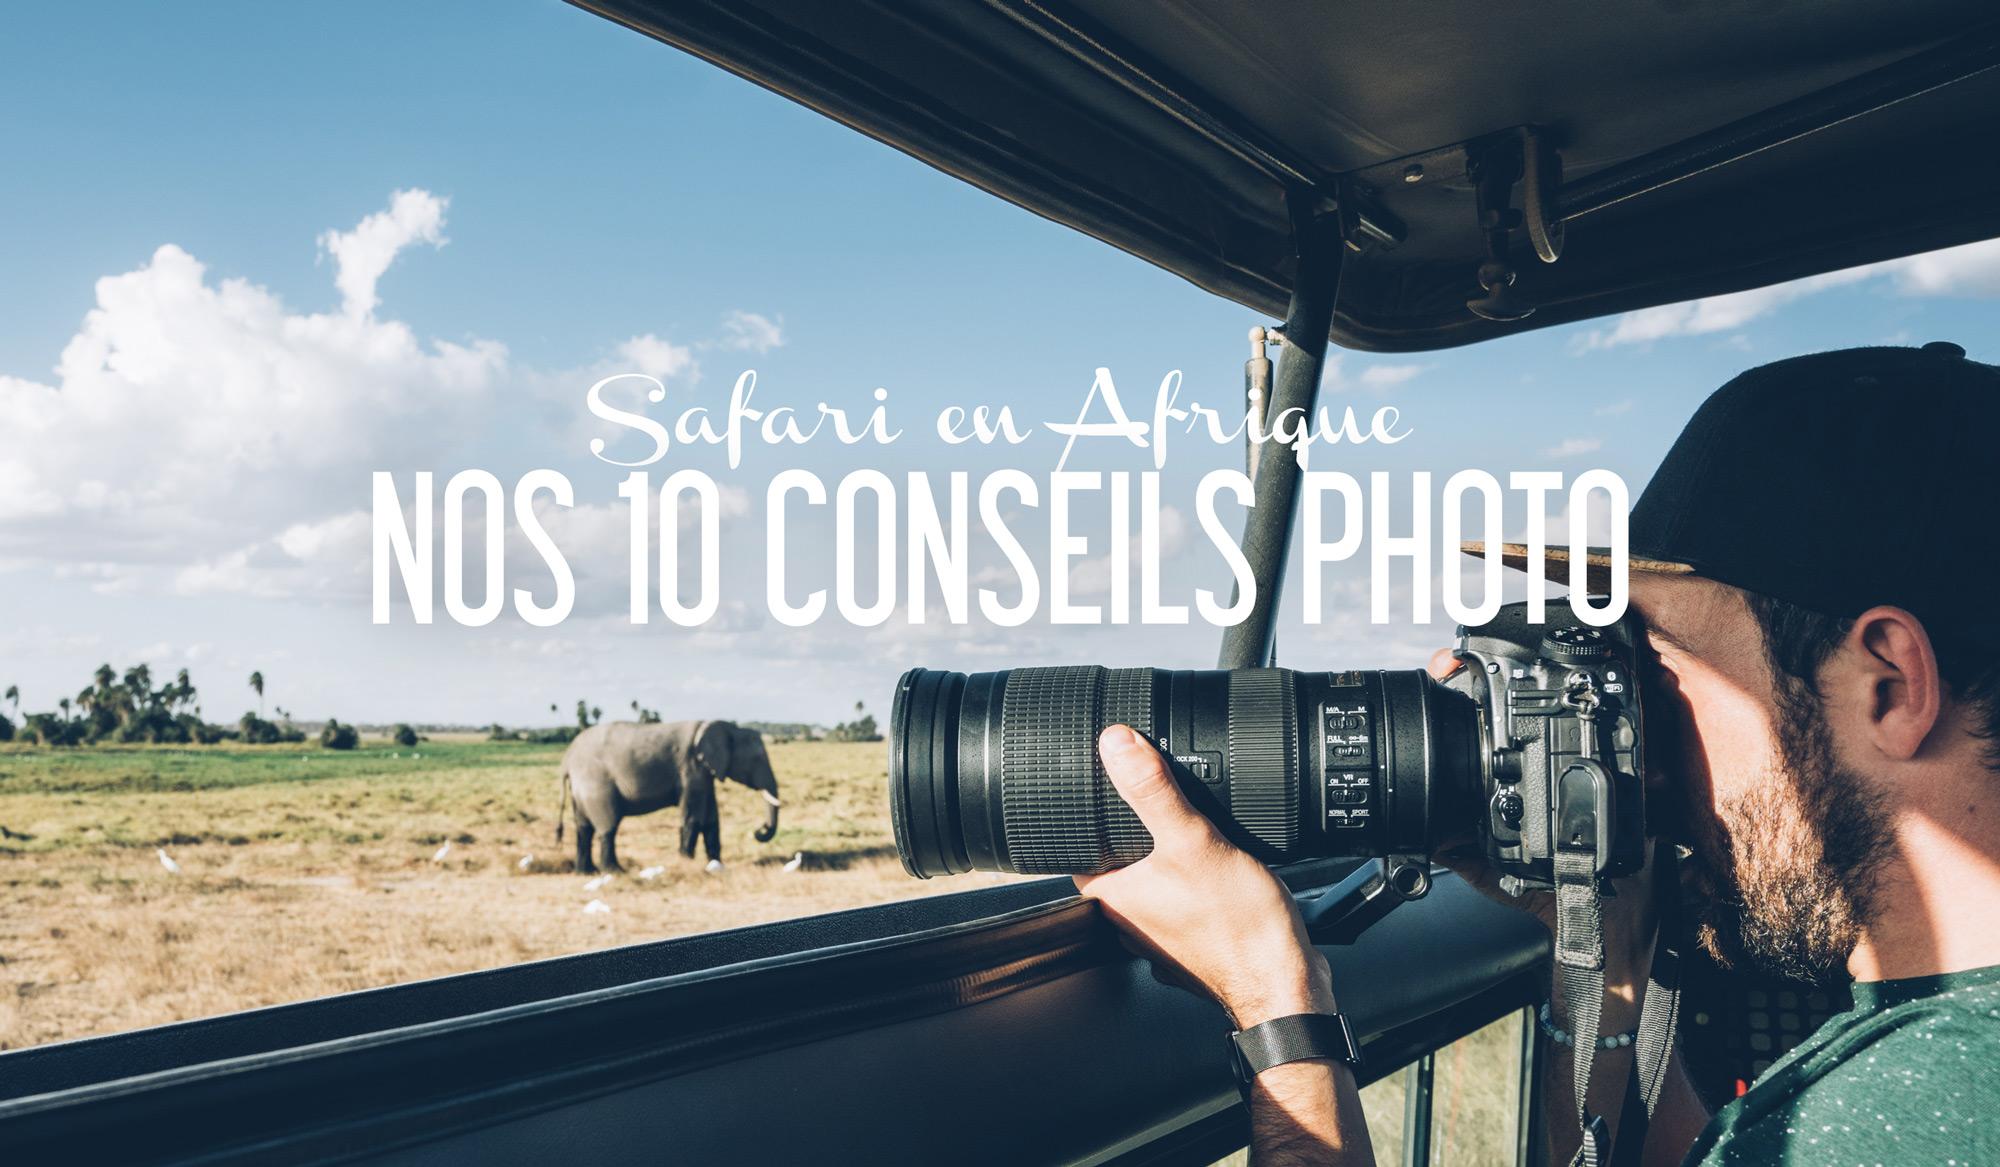 Nos 10 conseils photo pour réussir vos photos en Safari en Afrique